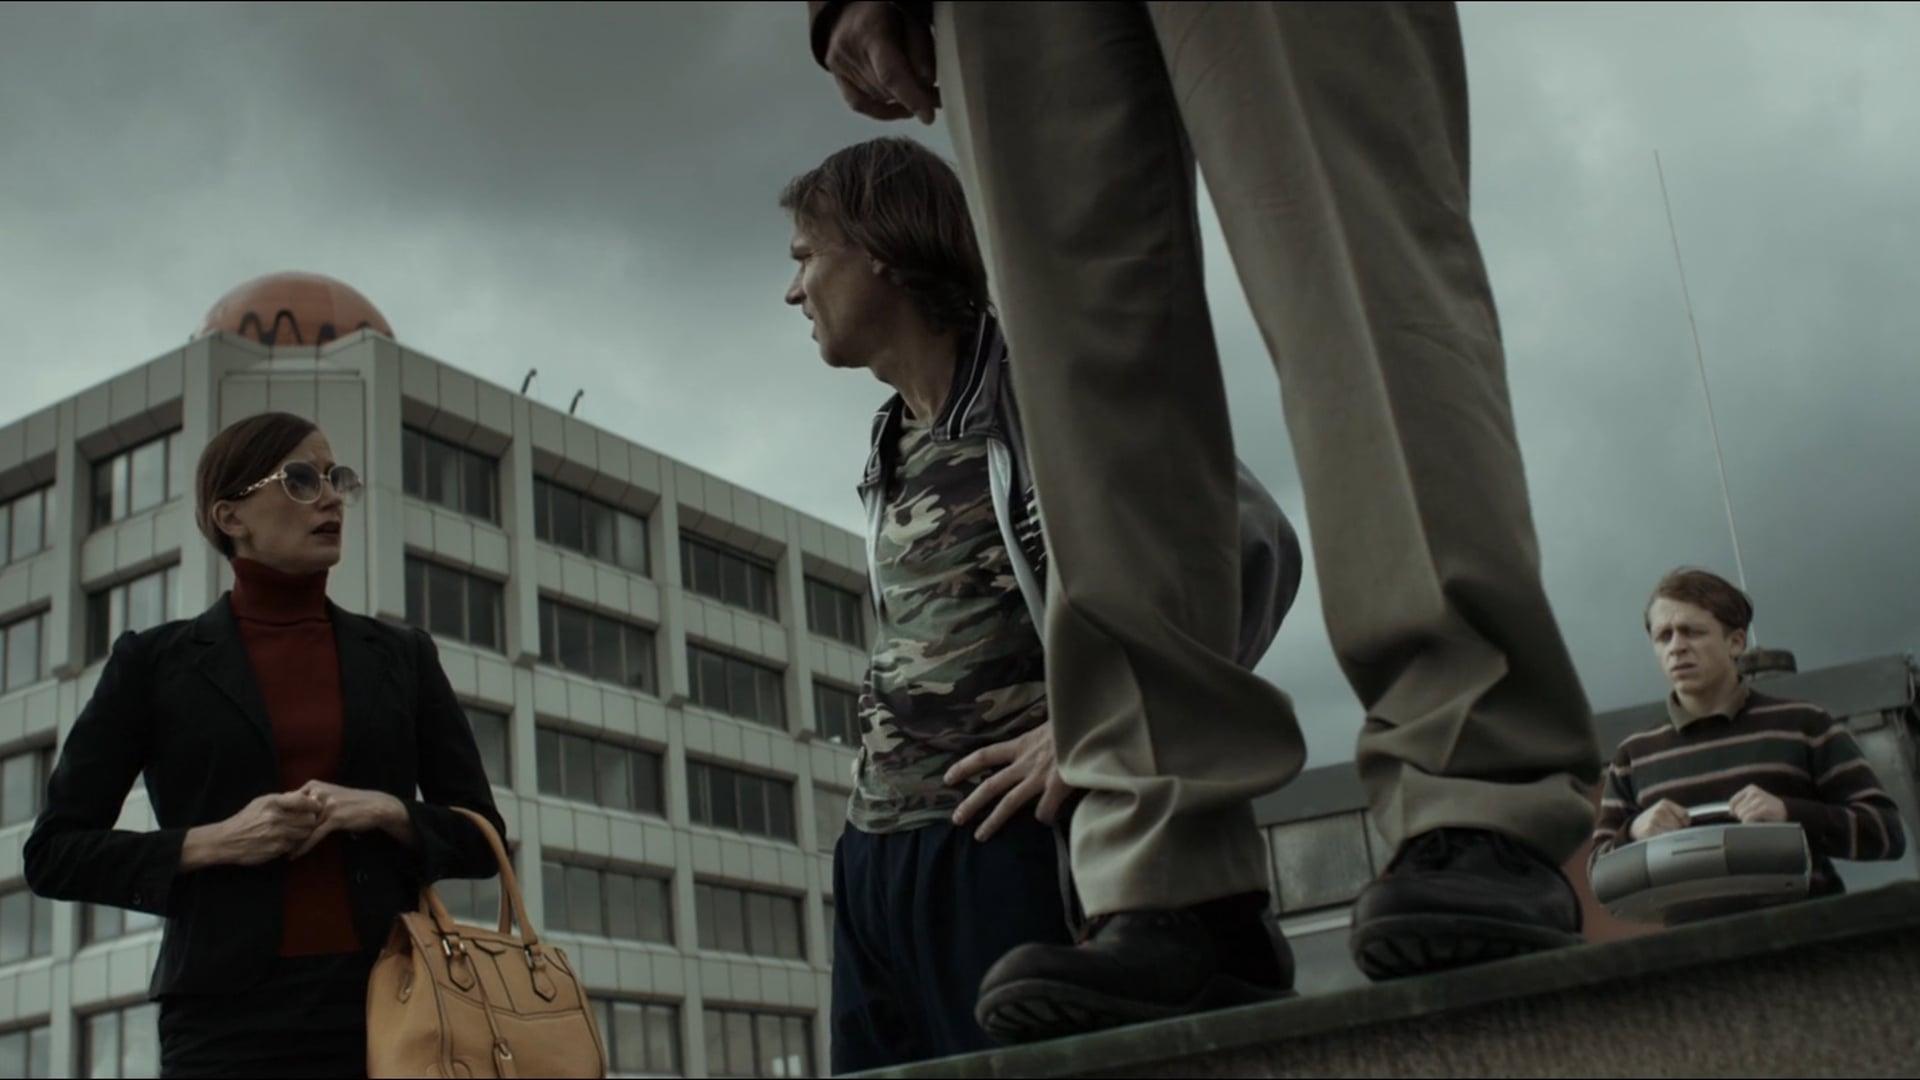 Die Randgruppe (Kurzfilm 2015)